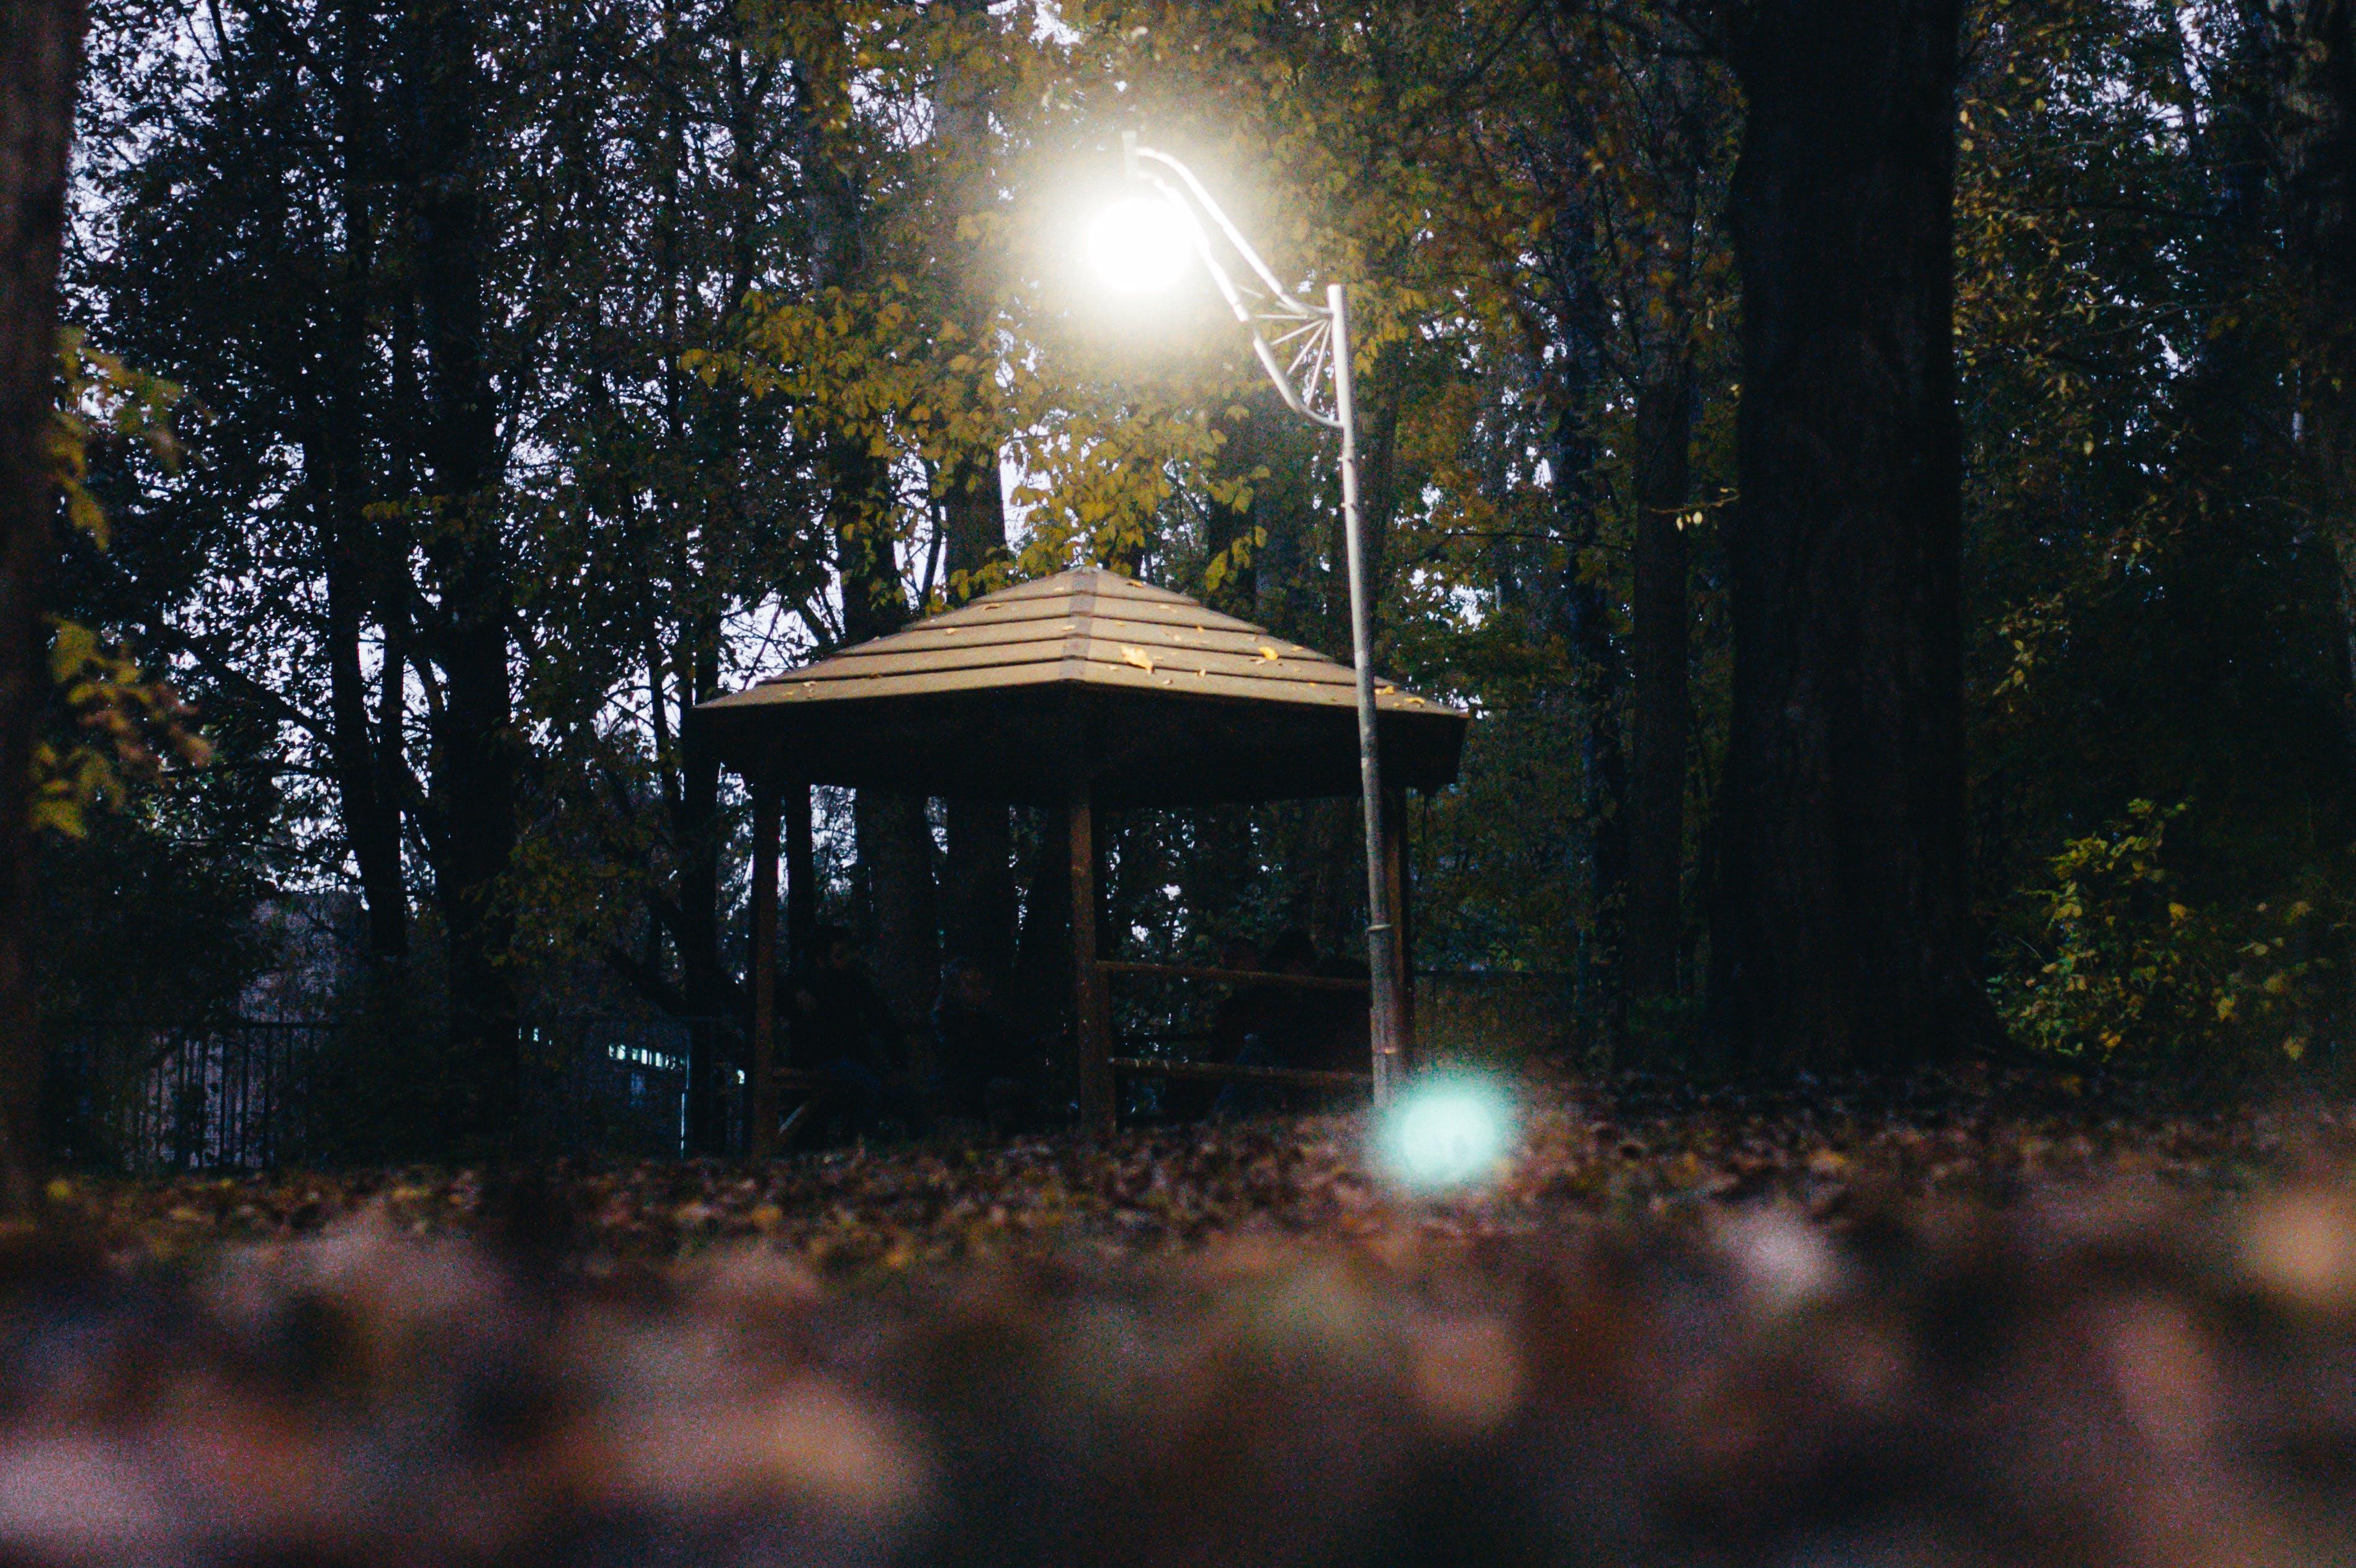 Free stock photo of forest, gazebo, lantern light, park